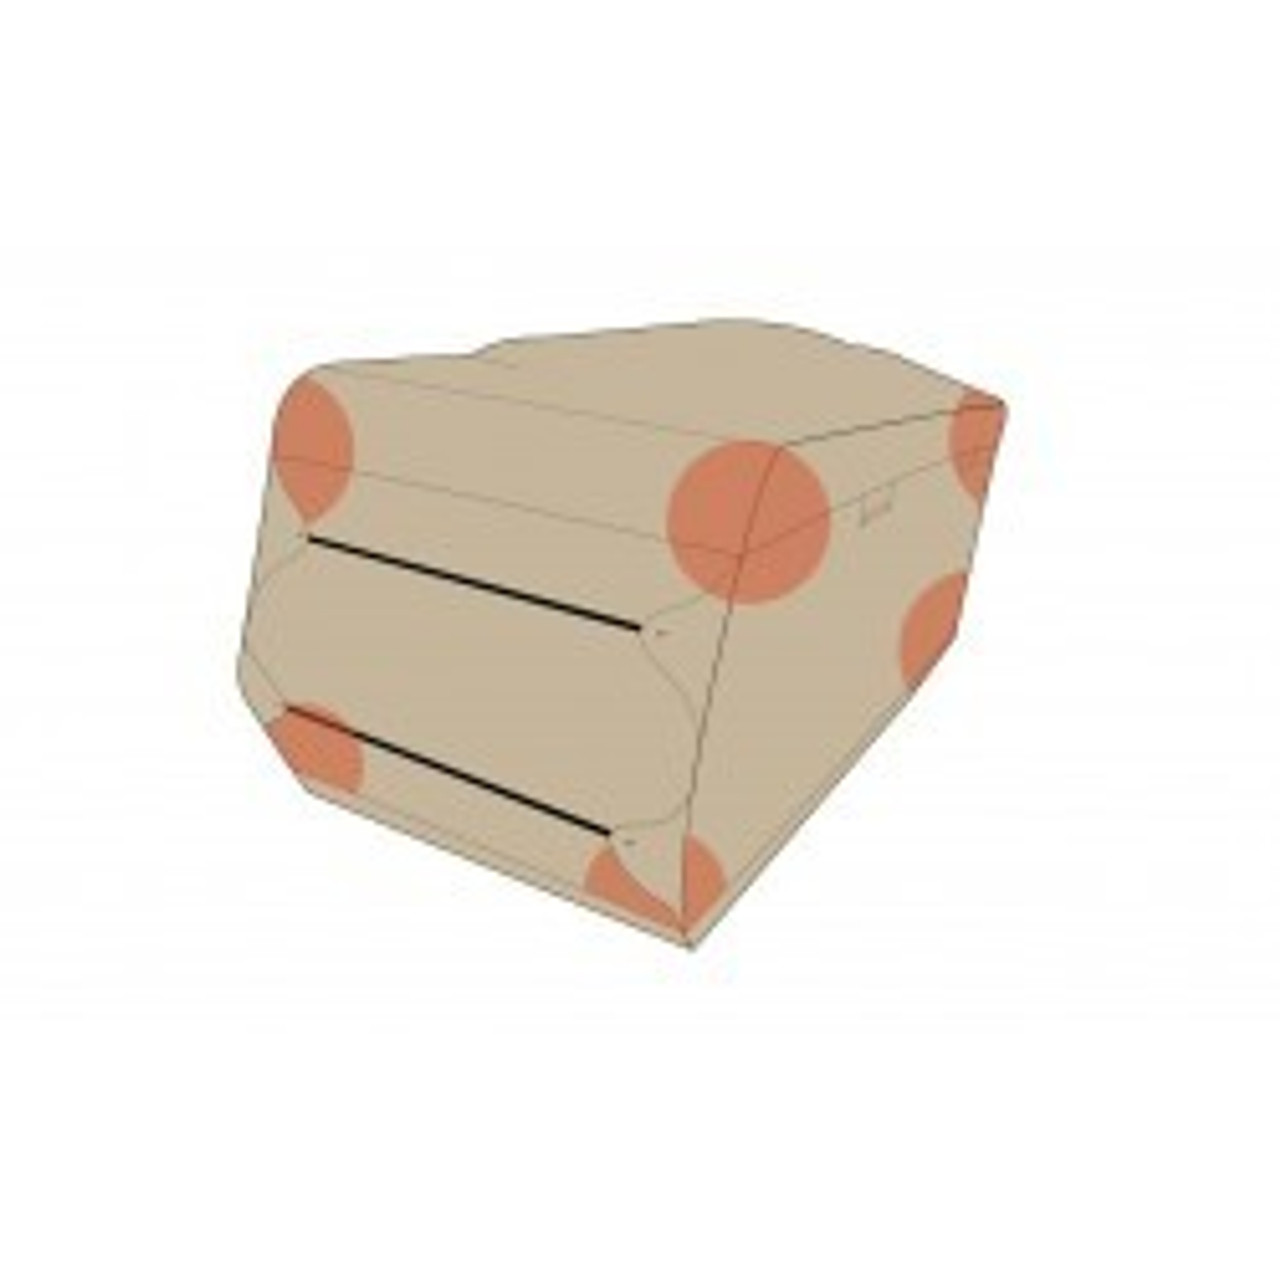 Storage Lot 4-Layer Polypropylene Covers